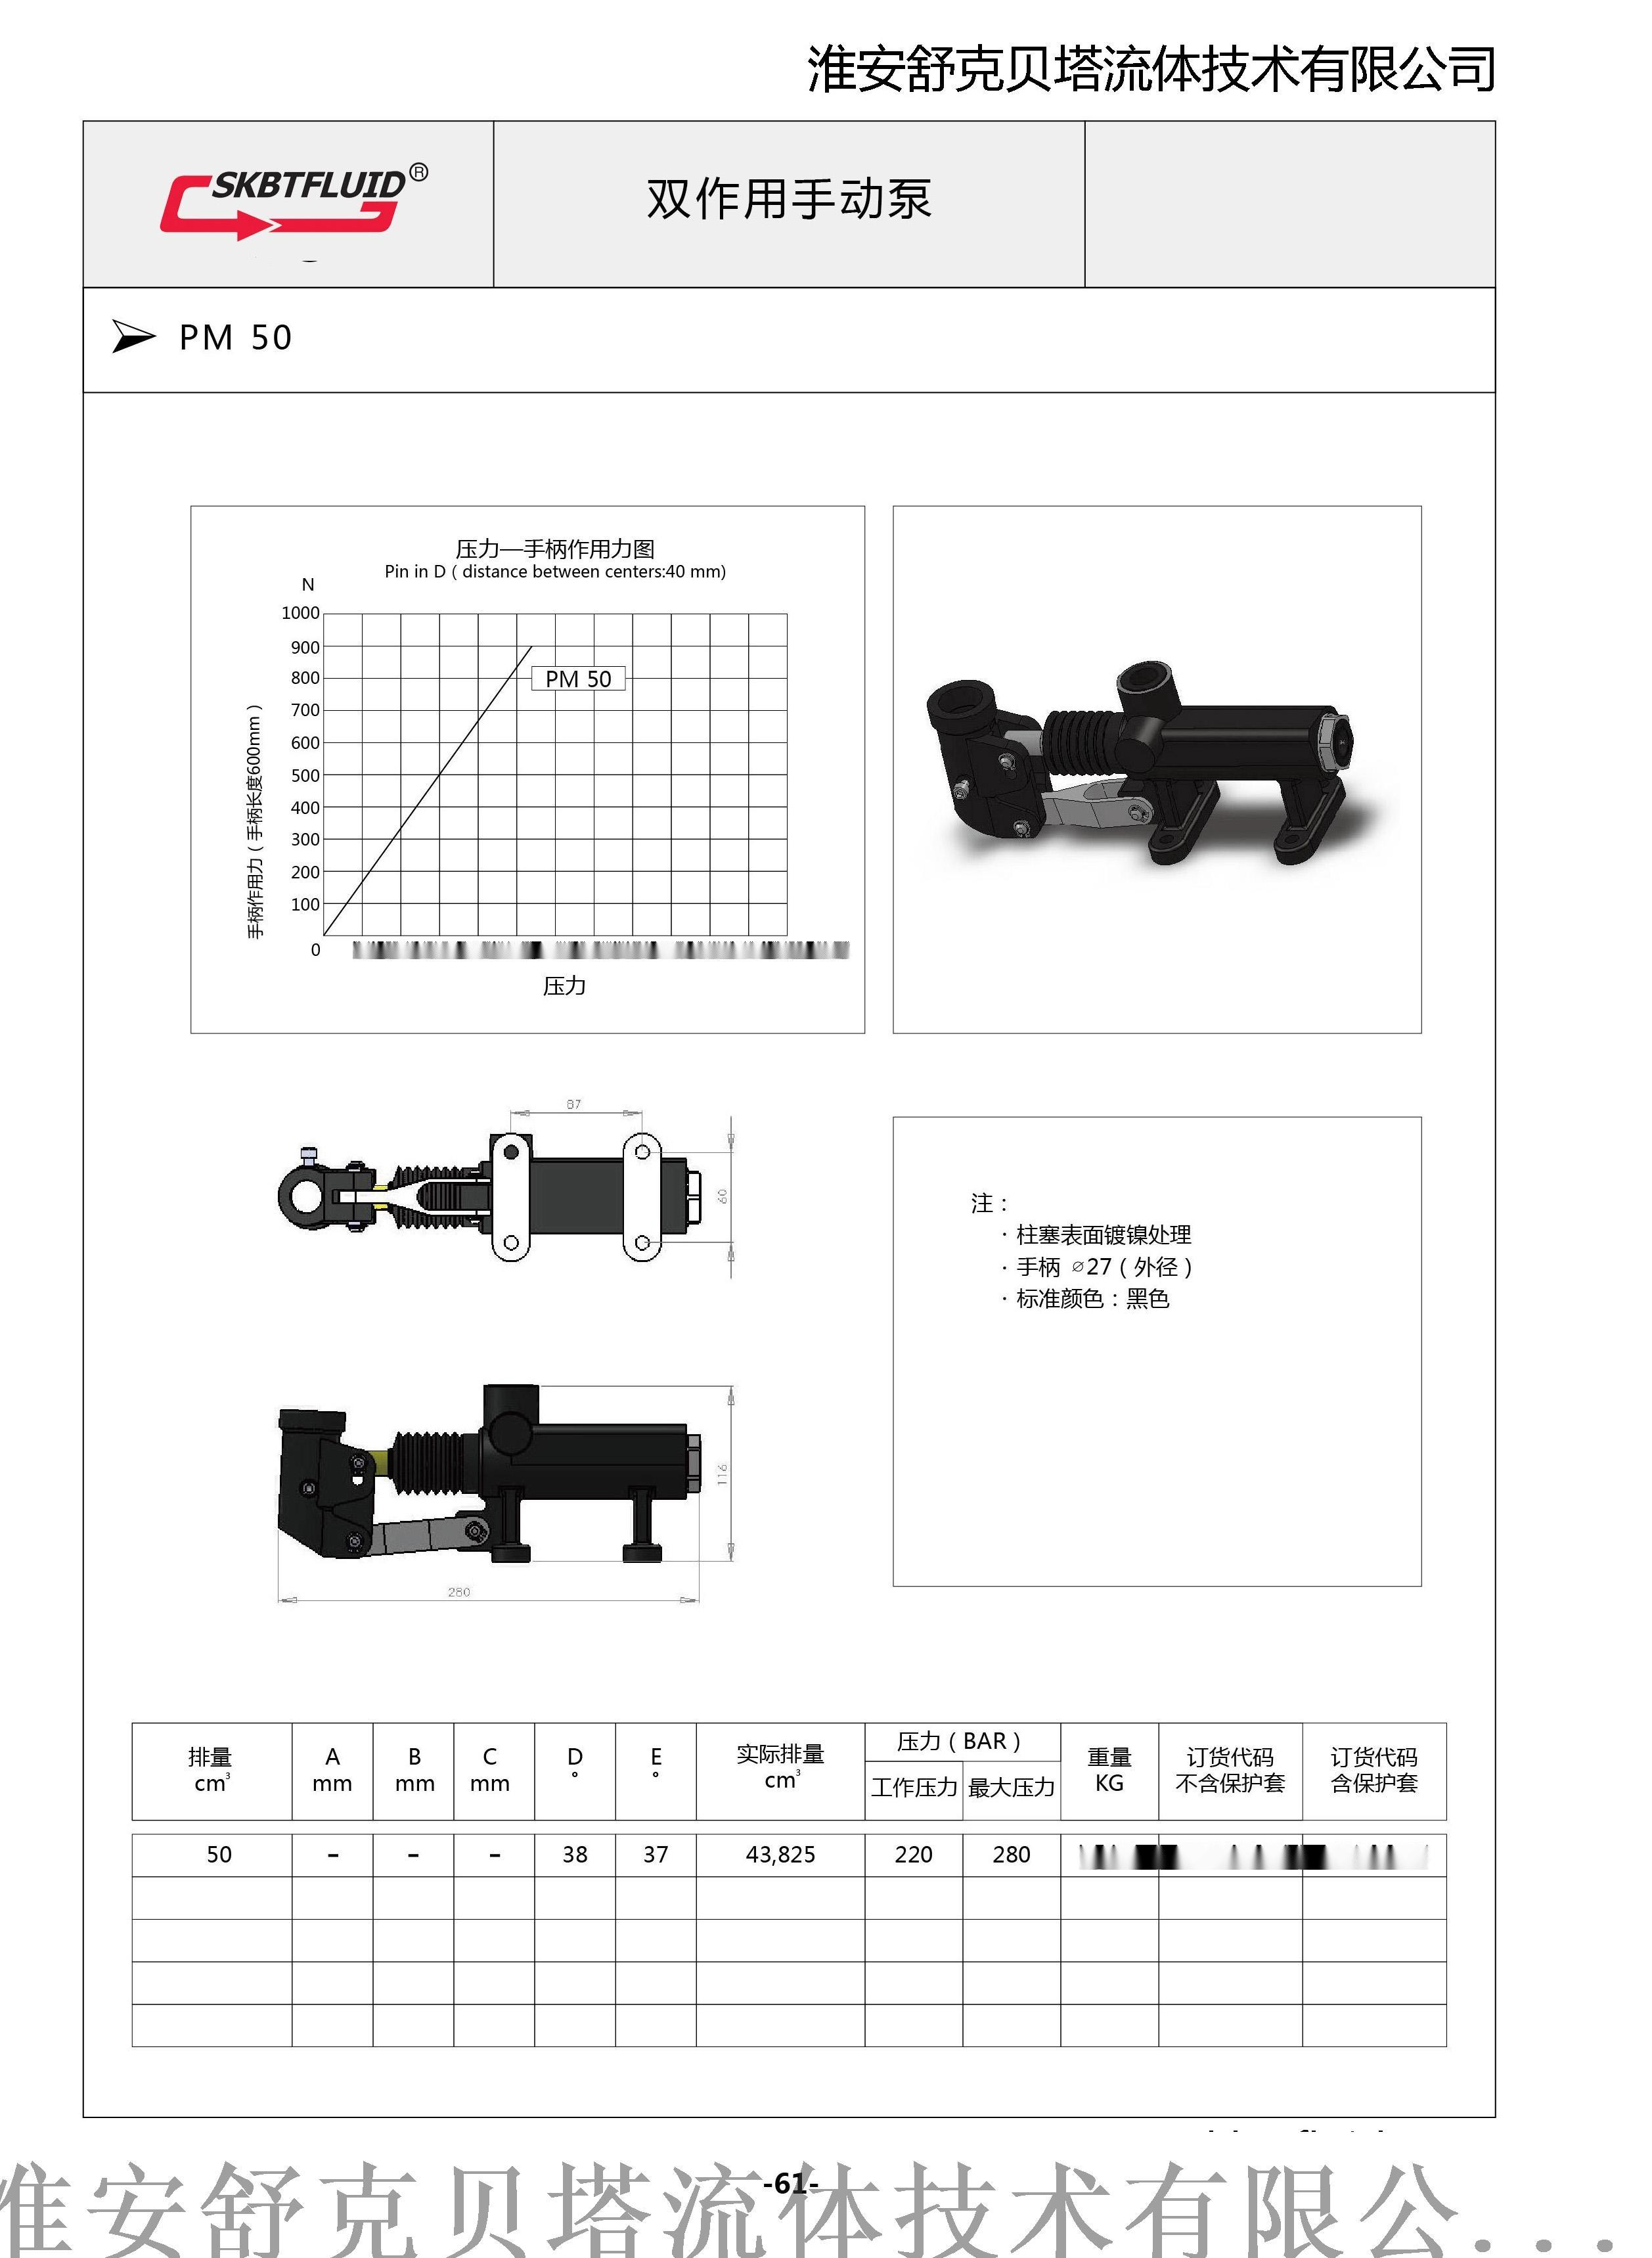 PM25单作用手动泵95338745